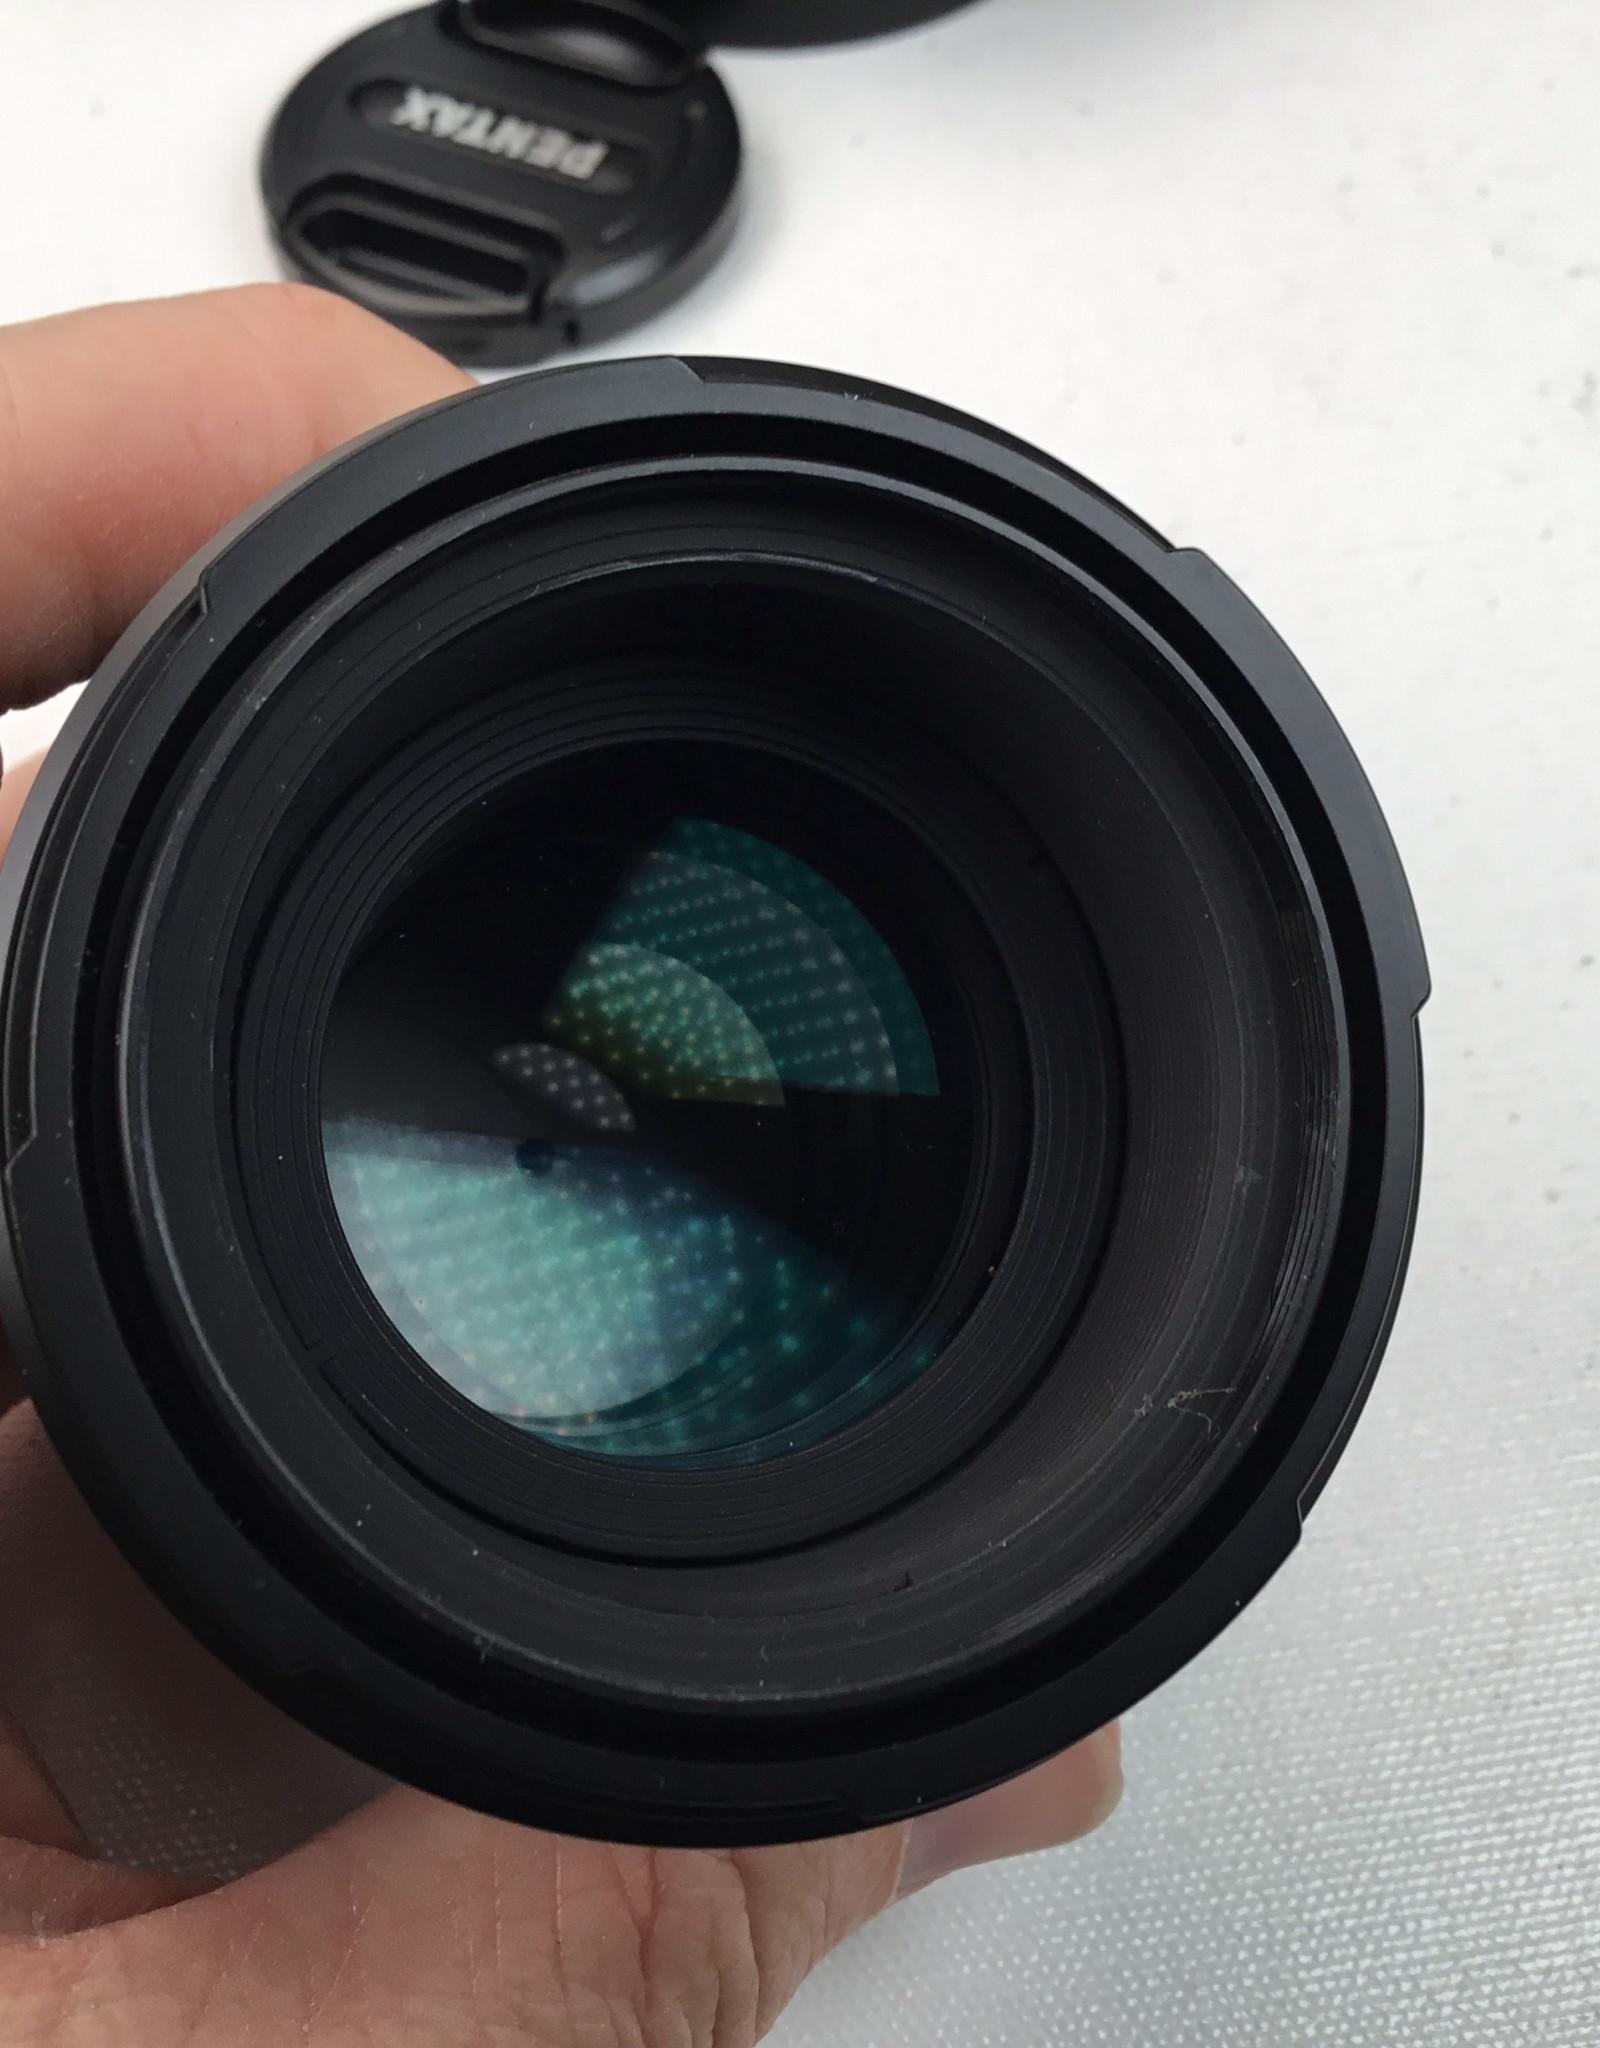 Pentax Pentax-D FA SMC Macro 100mm f2.8 WR Lens in Box Used EX